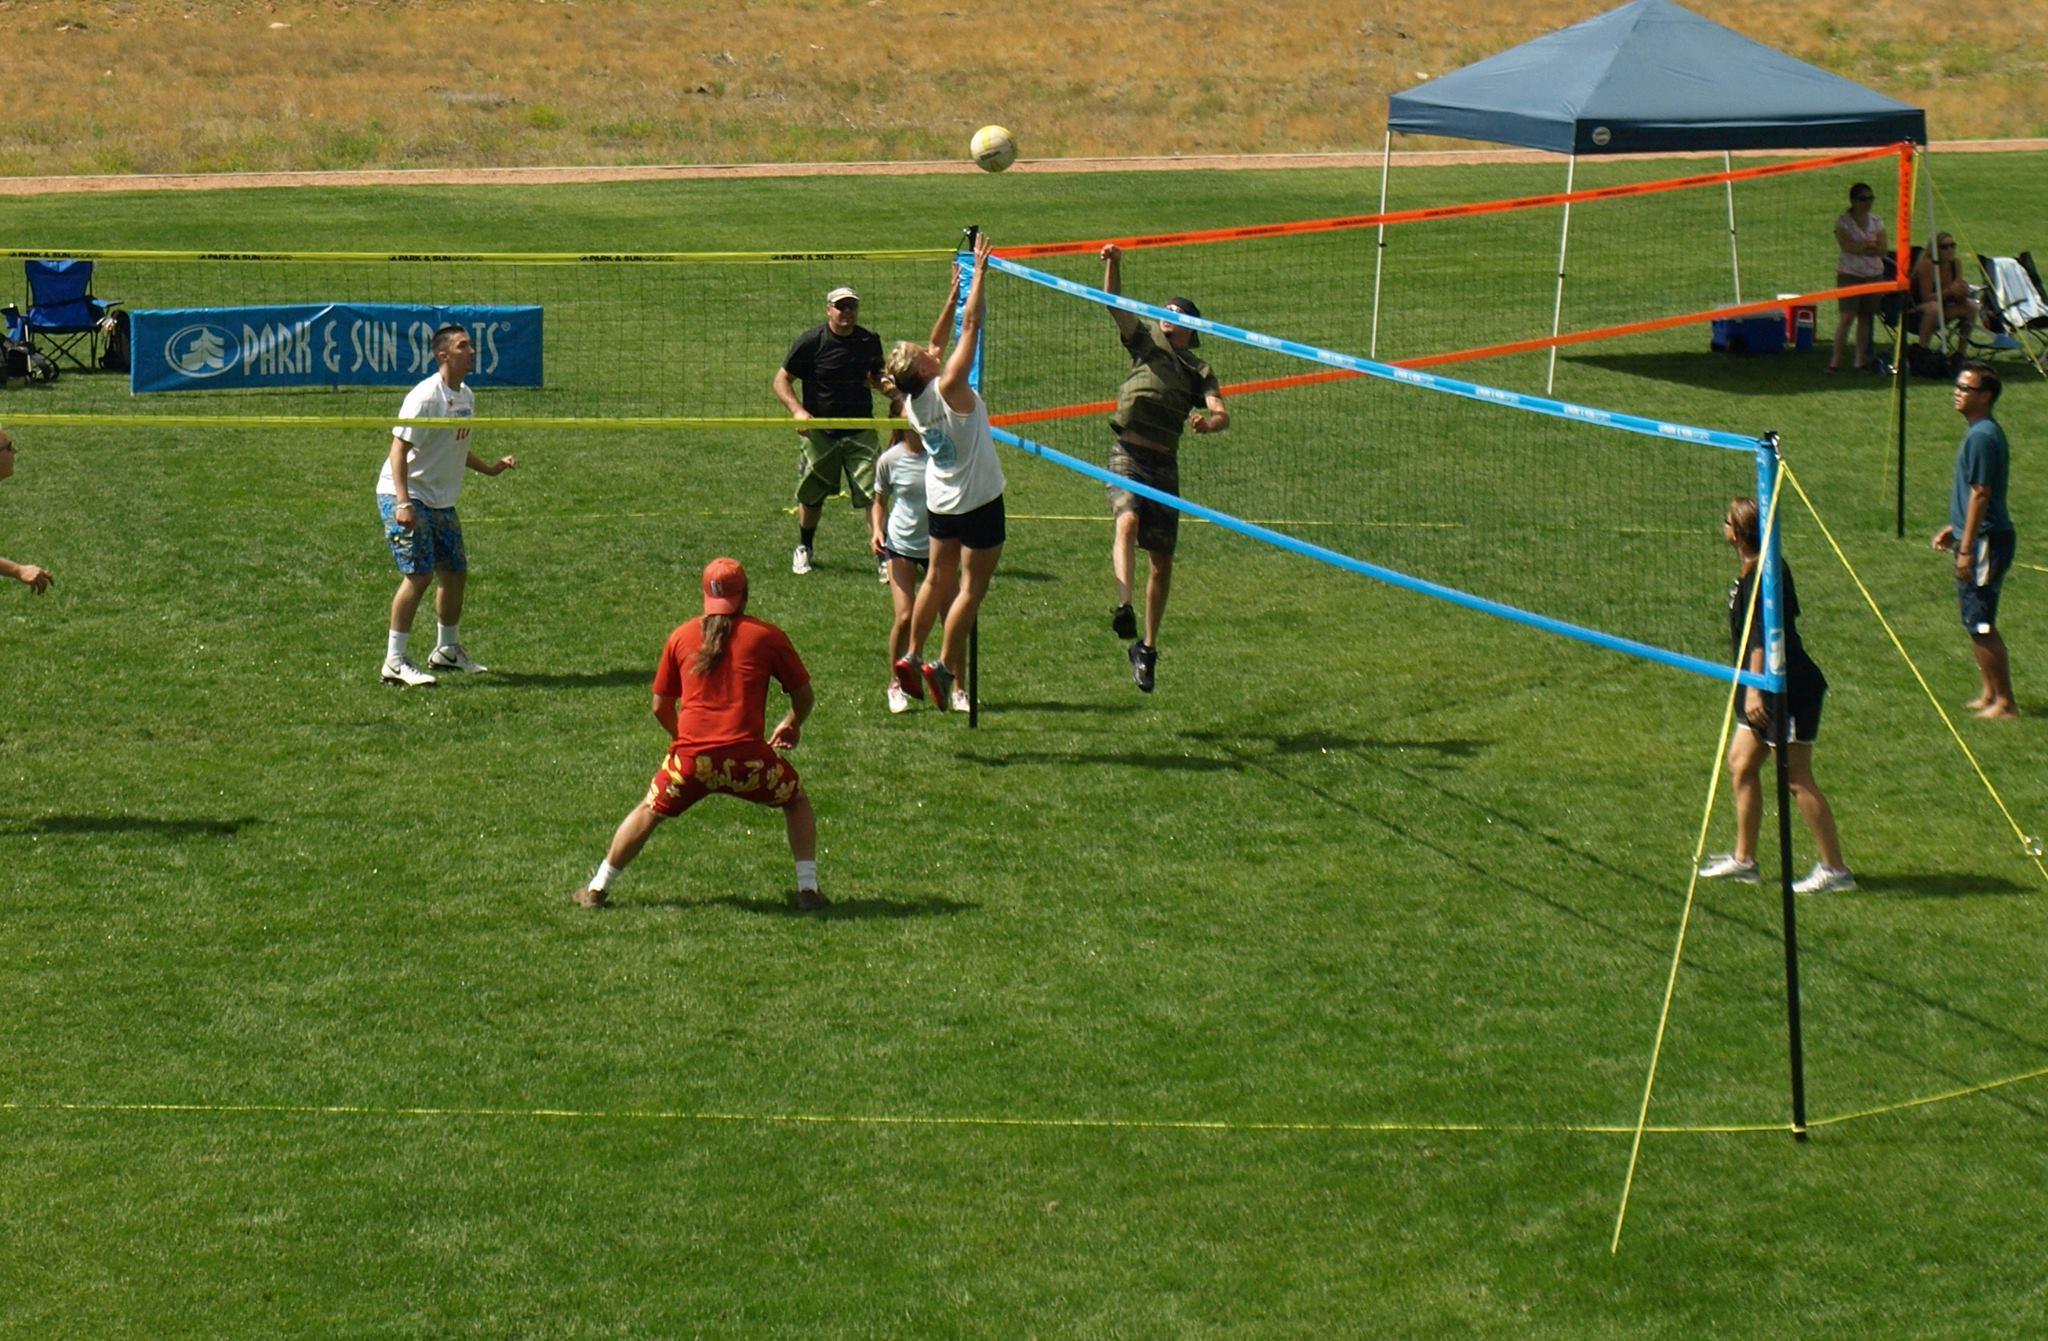 Saturday May 15th Flagstaff grass Tri-Ball